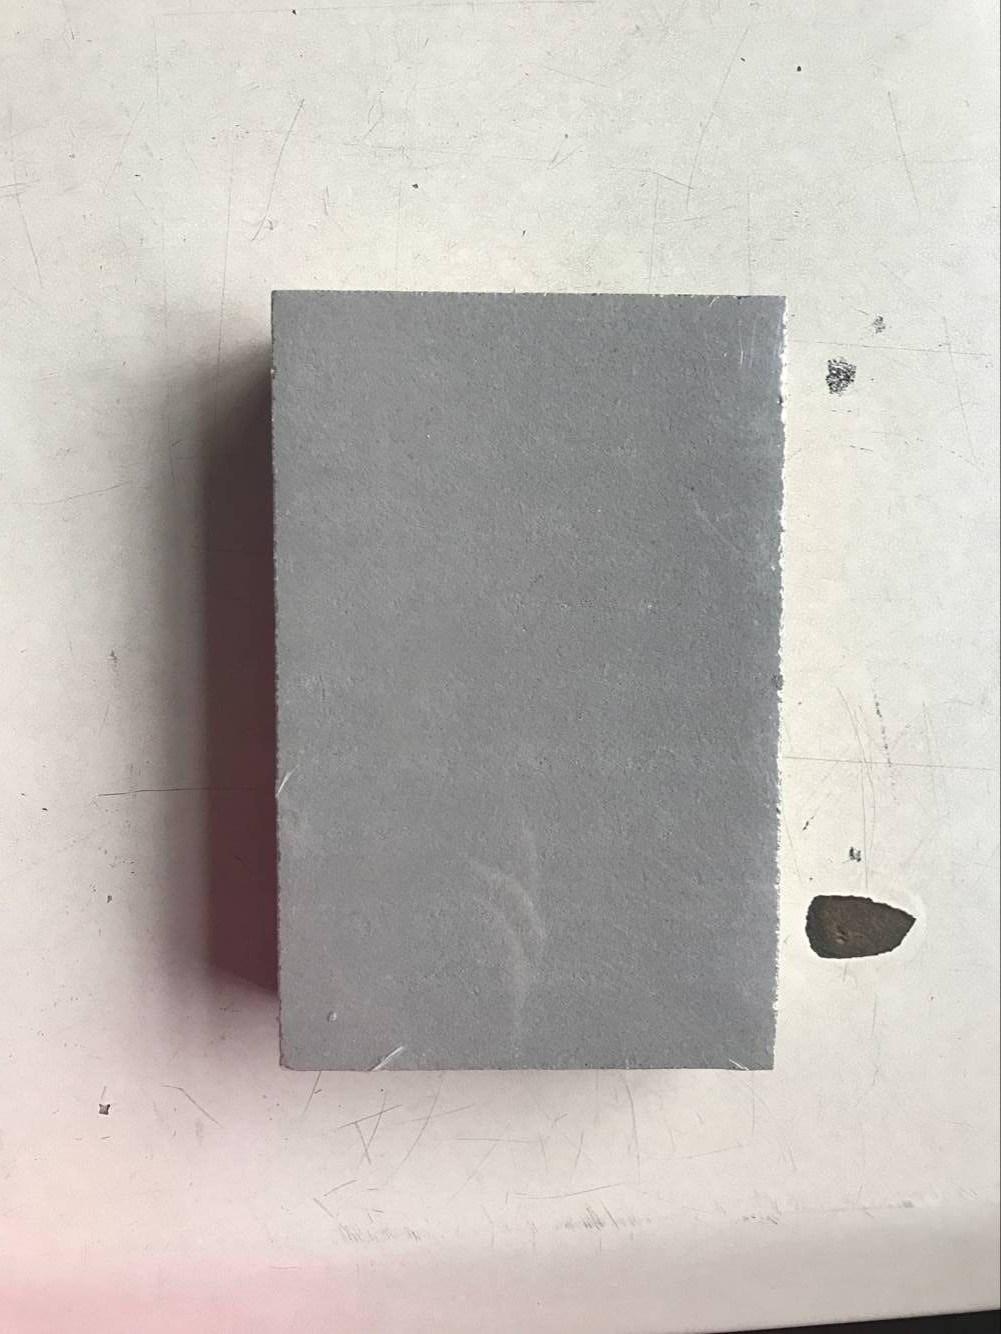 New Heating Insulation Materials (Fiberglass with PU coating)